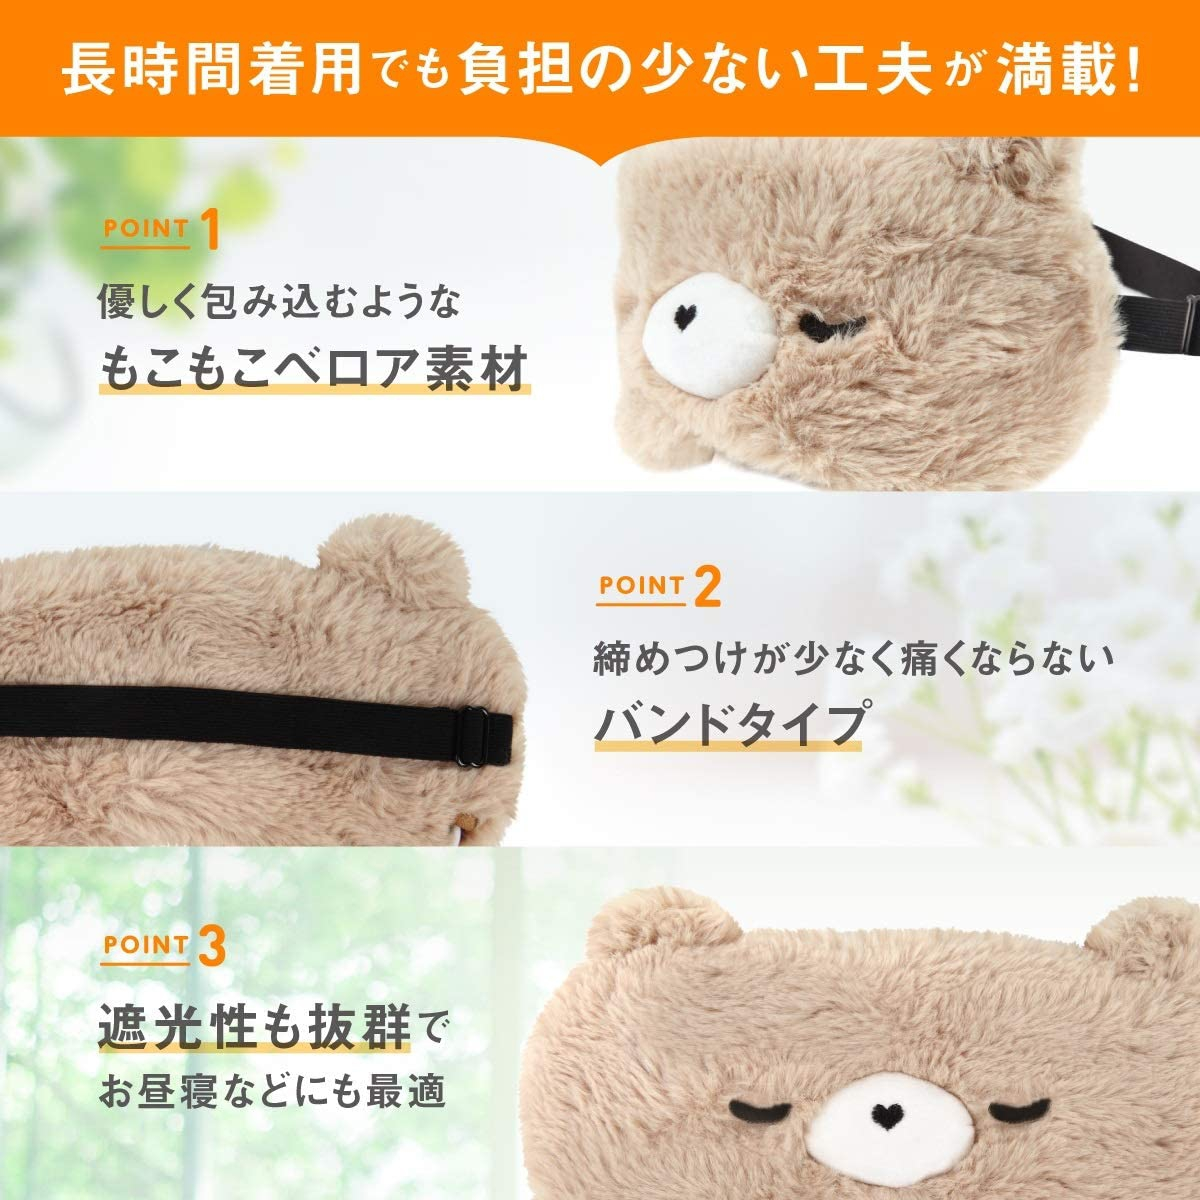 Anmin(アンミン) モコモコ ホットアイマスクの商品画像4